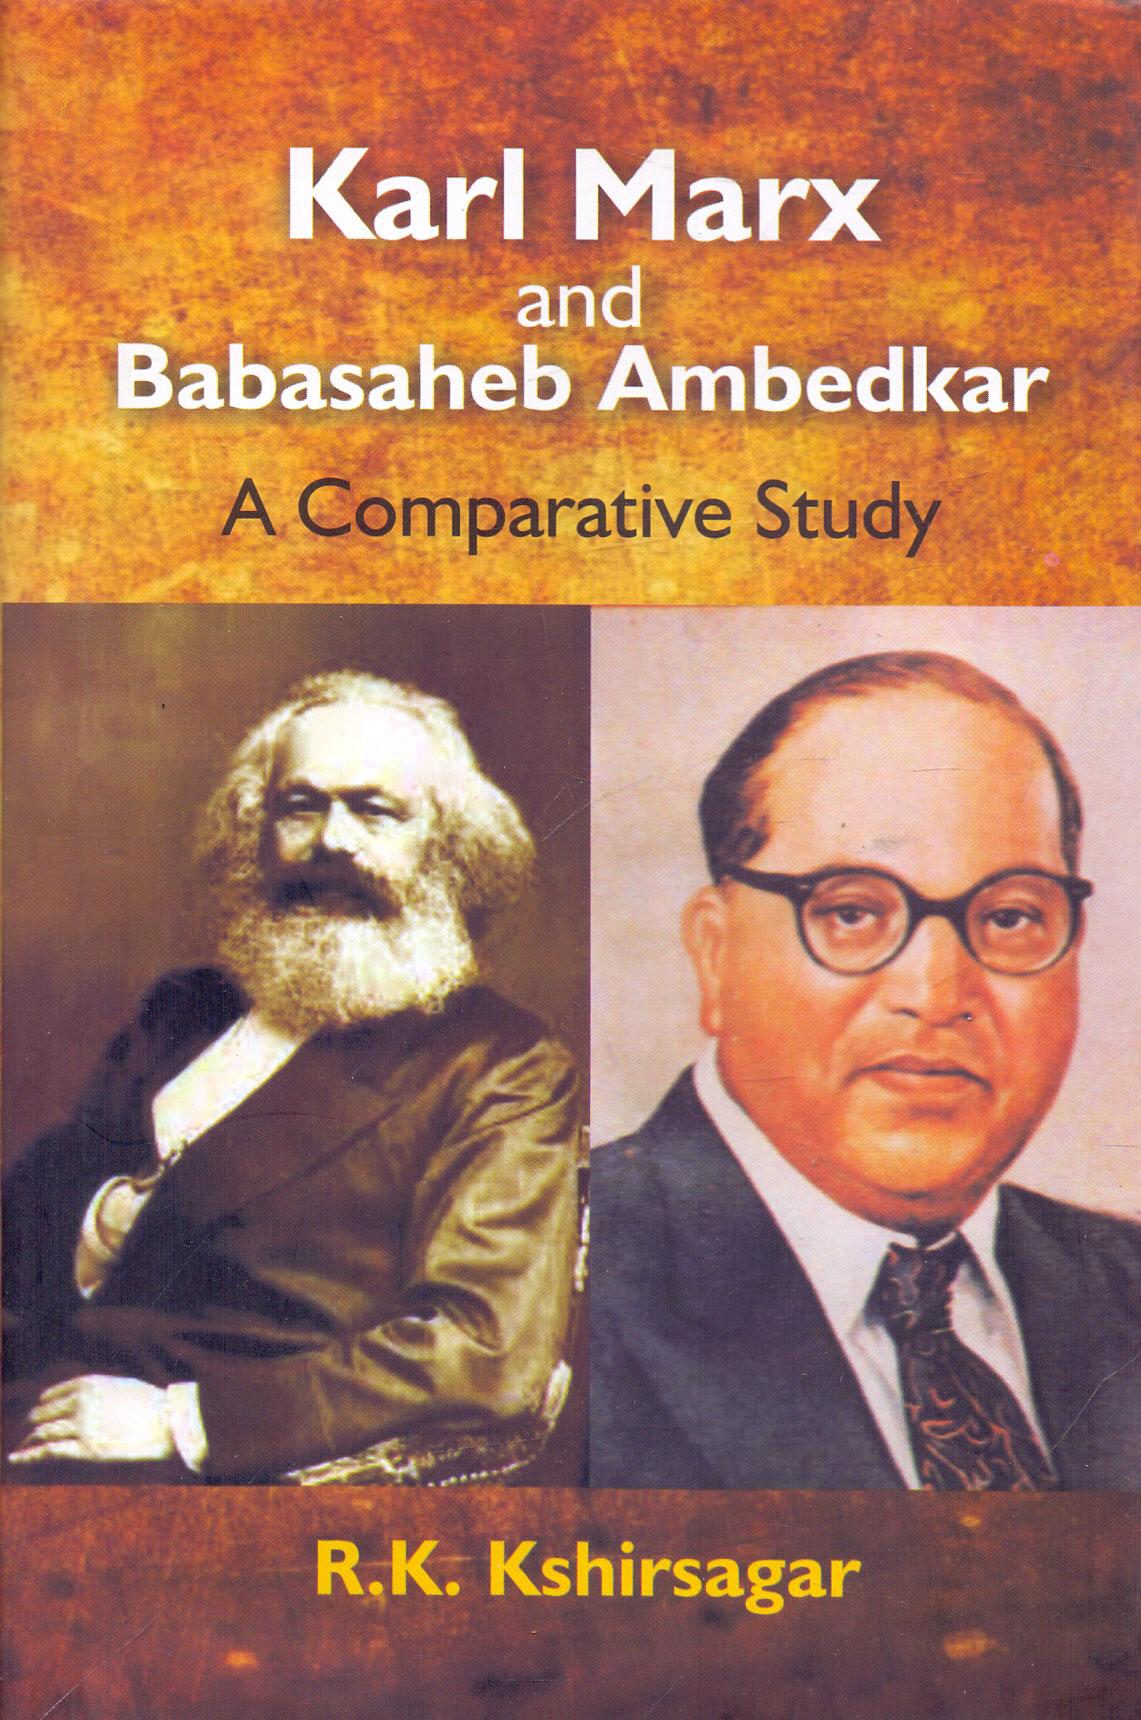 Karl Marx and Babasaheb Ambedkar a Comparative Study